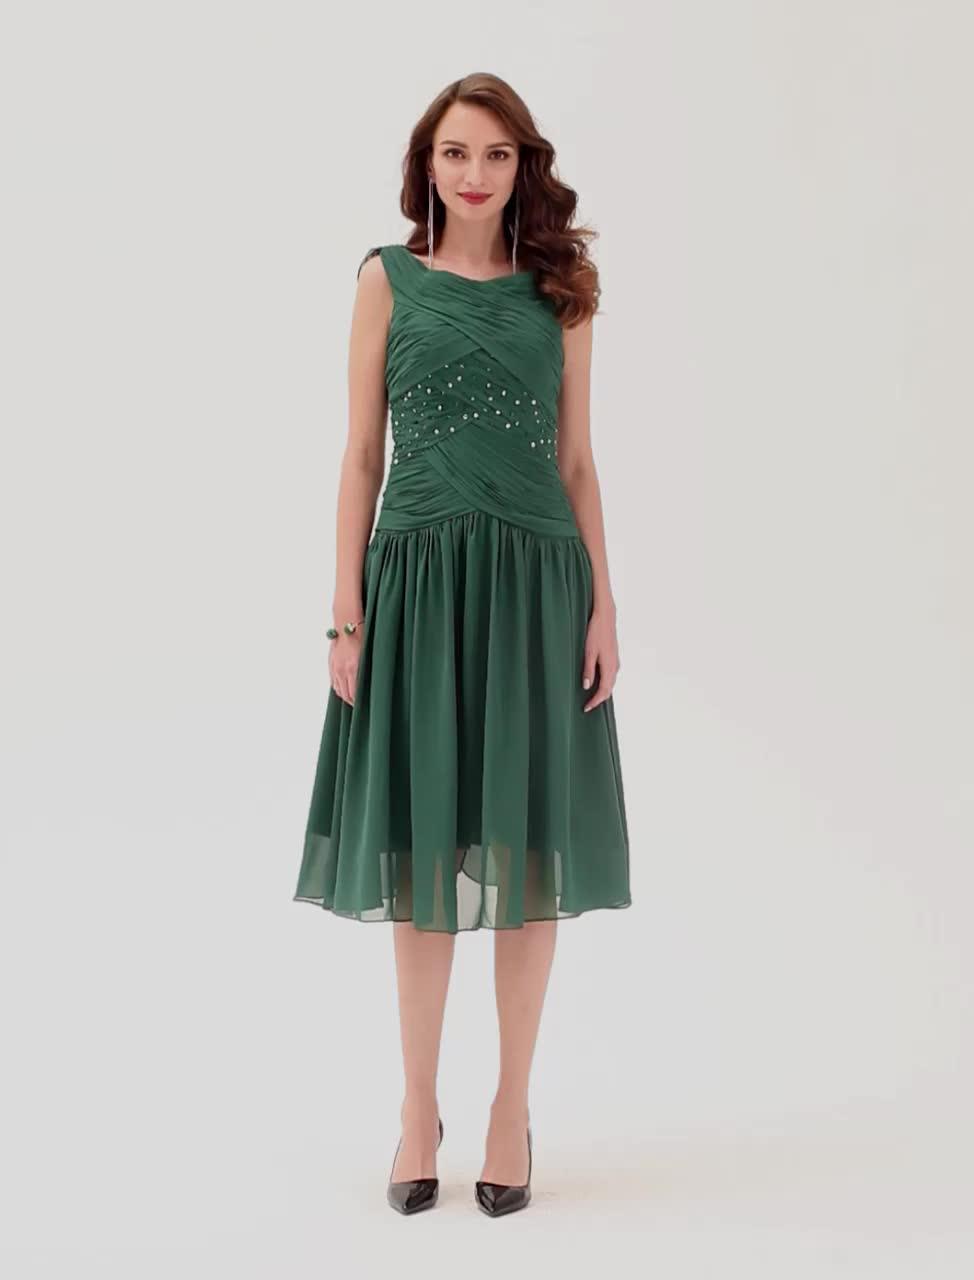 LightInTheBox Dresses Scam